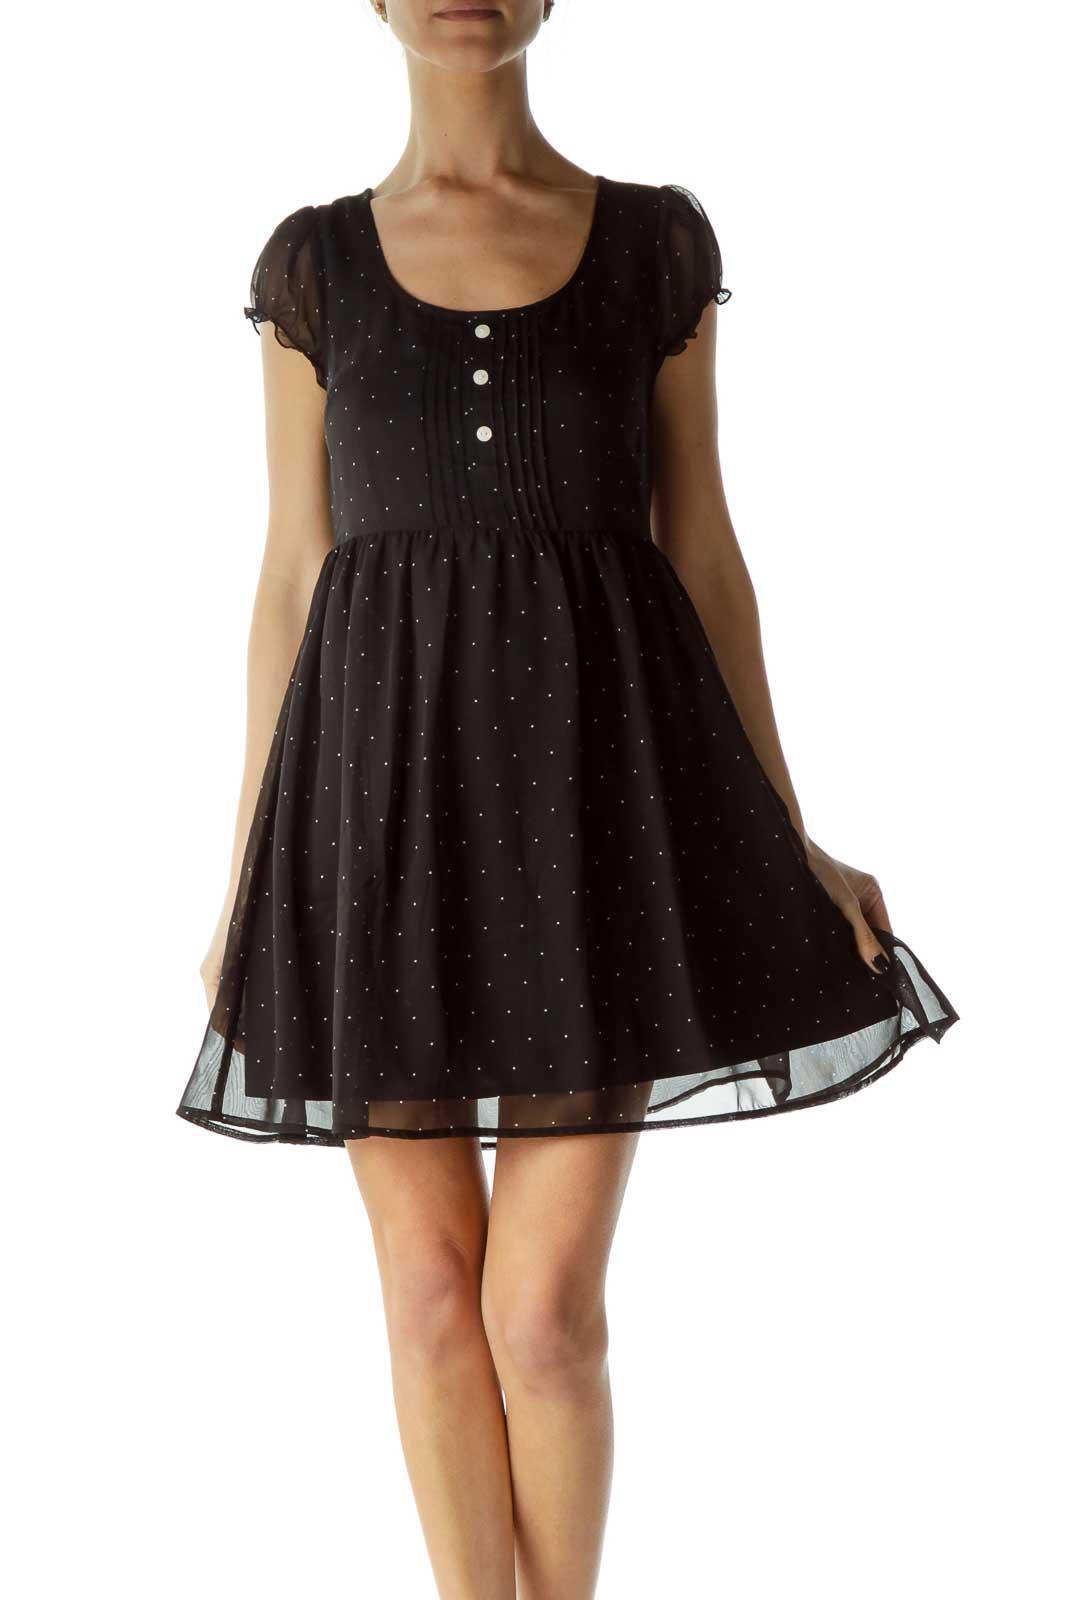 Black White Polka-Dot Day Dress Front